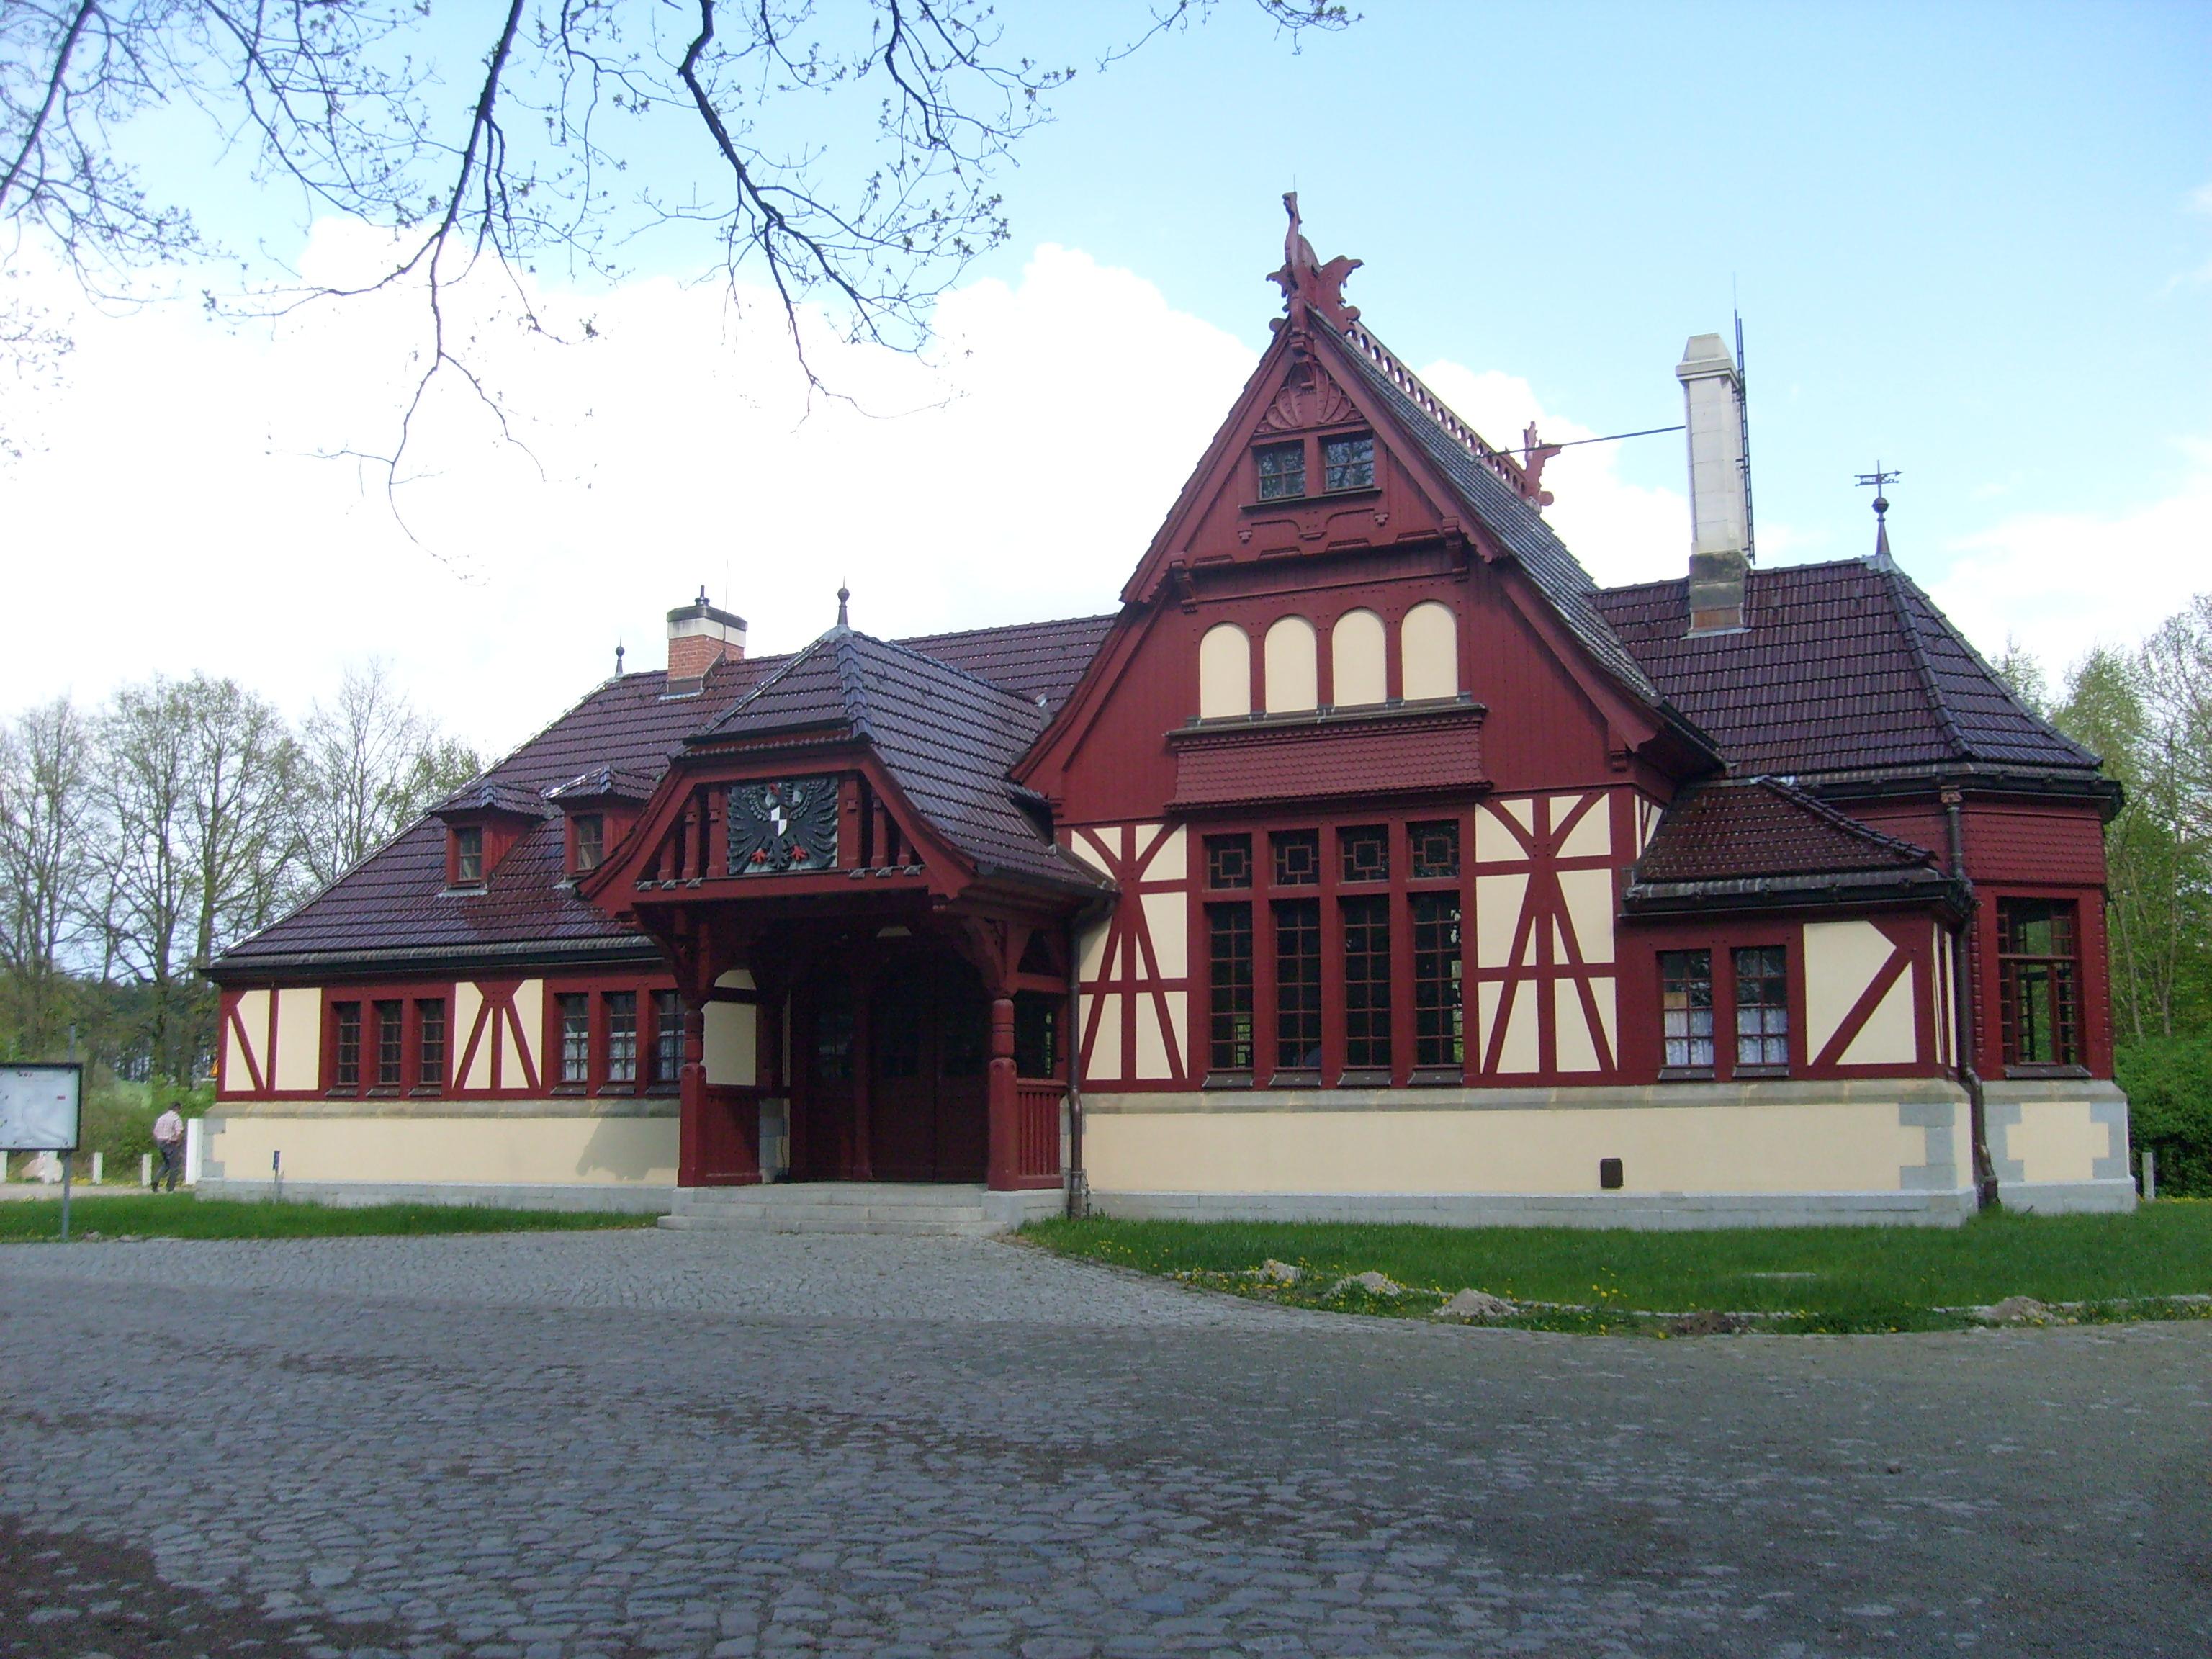 Kaiserbahnhof